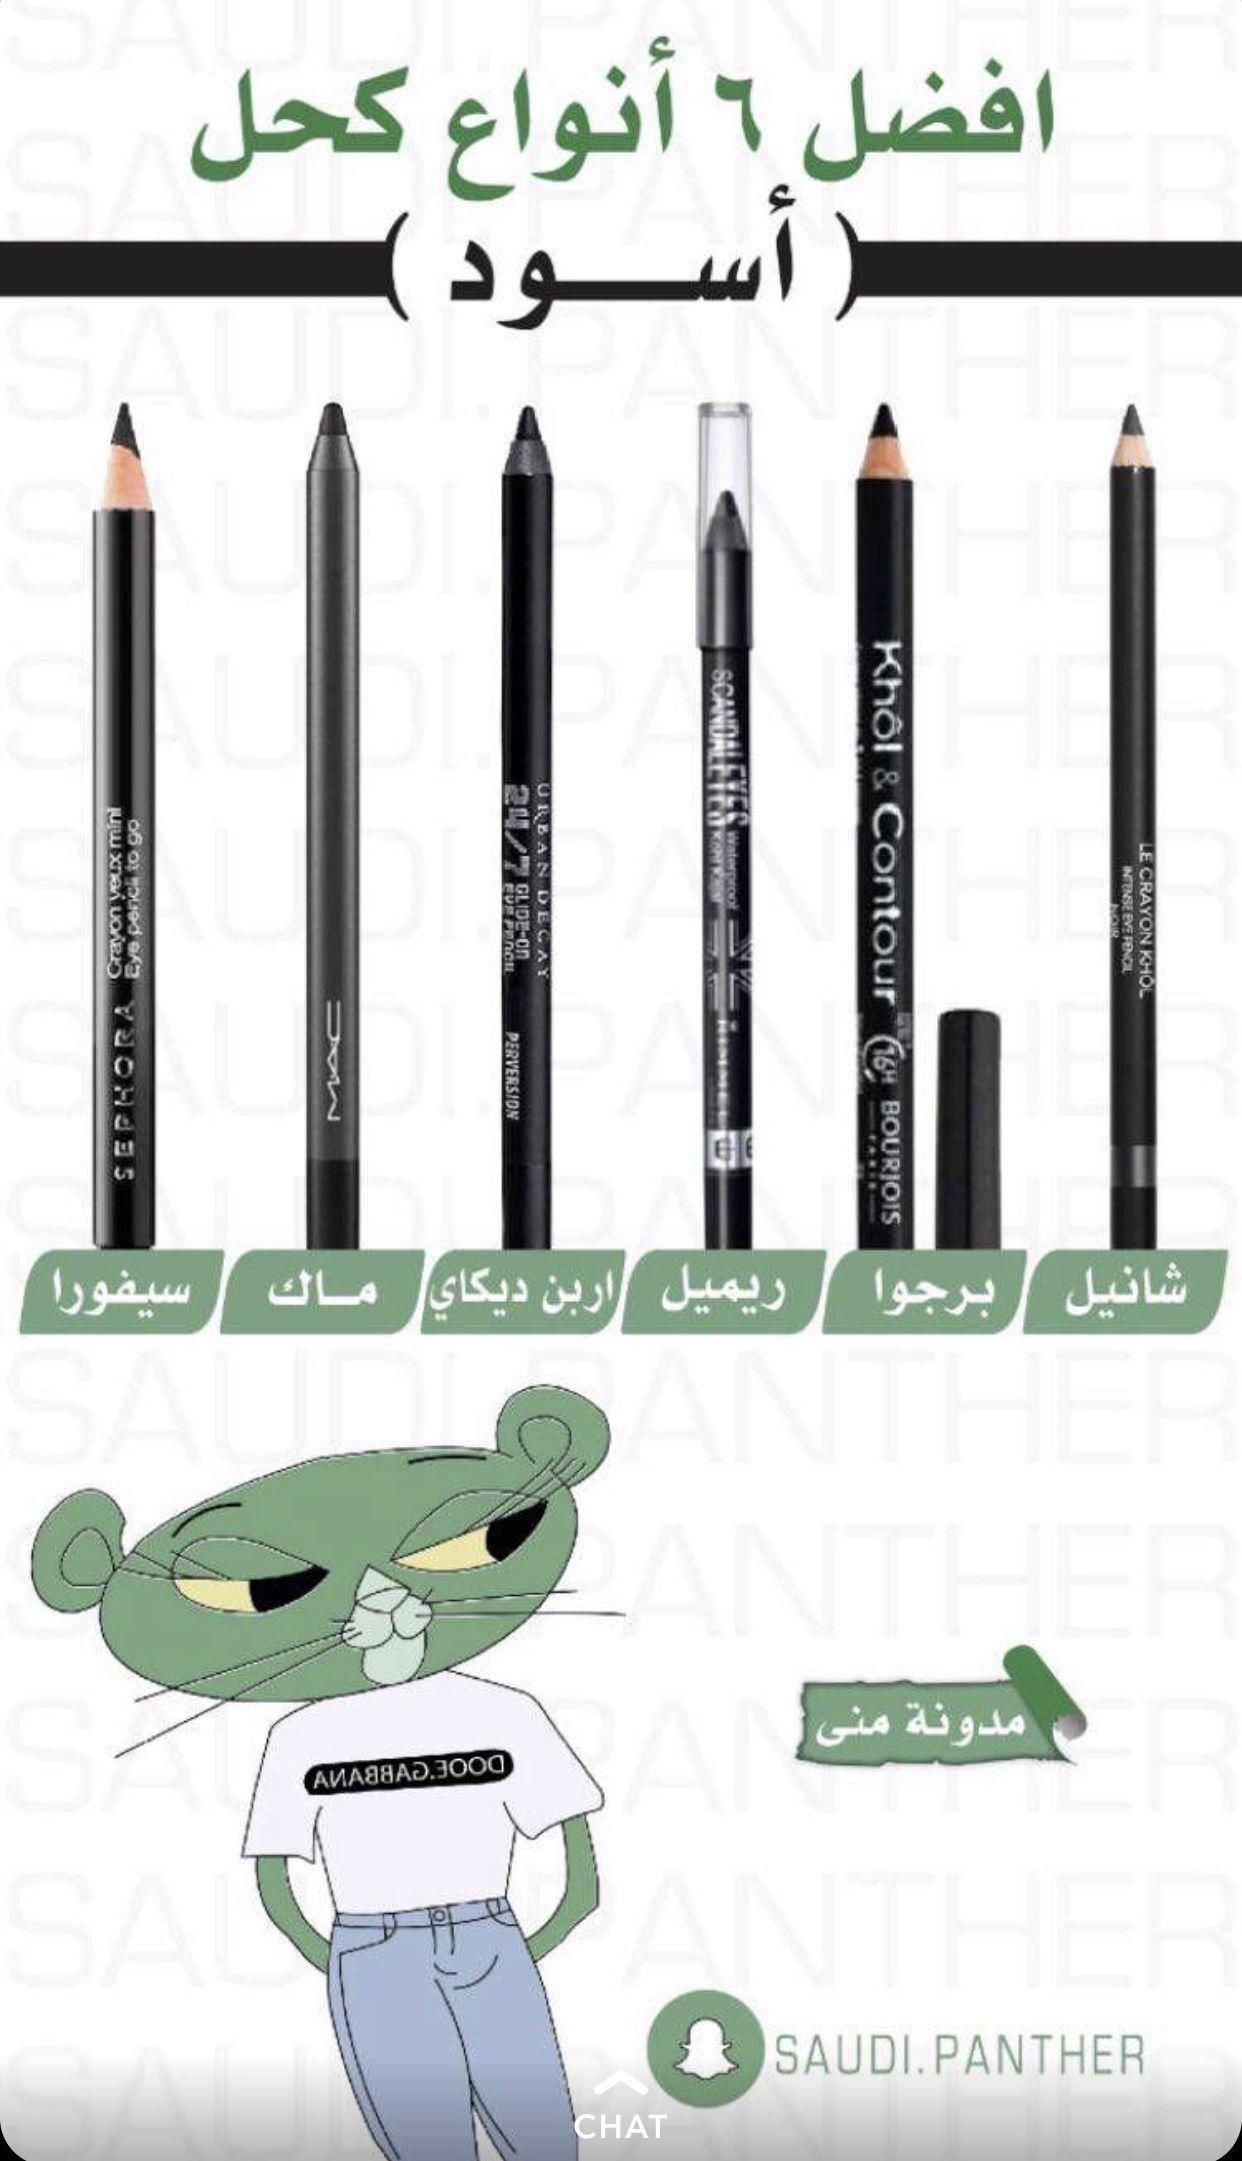 افضل 6 انواع كحل Dry Skin Makeup Beauty Makeup Tutorial Makeup Eyeliner